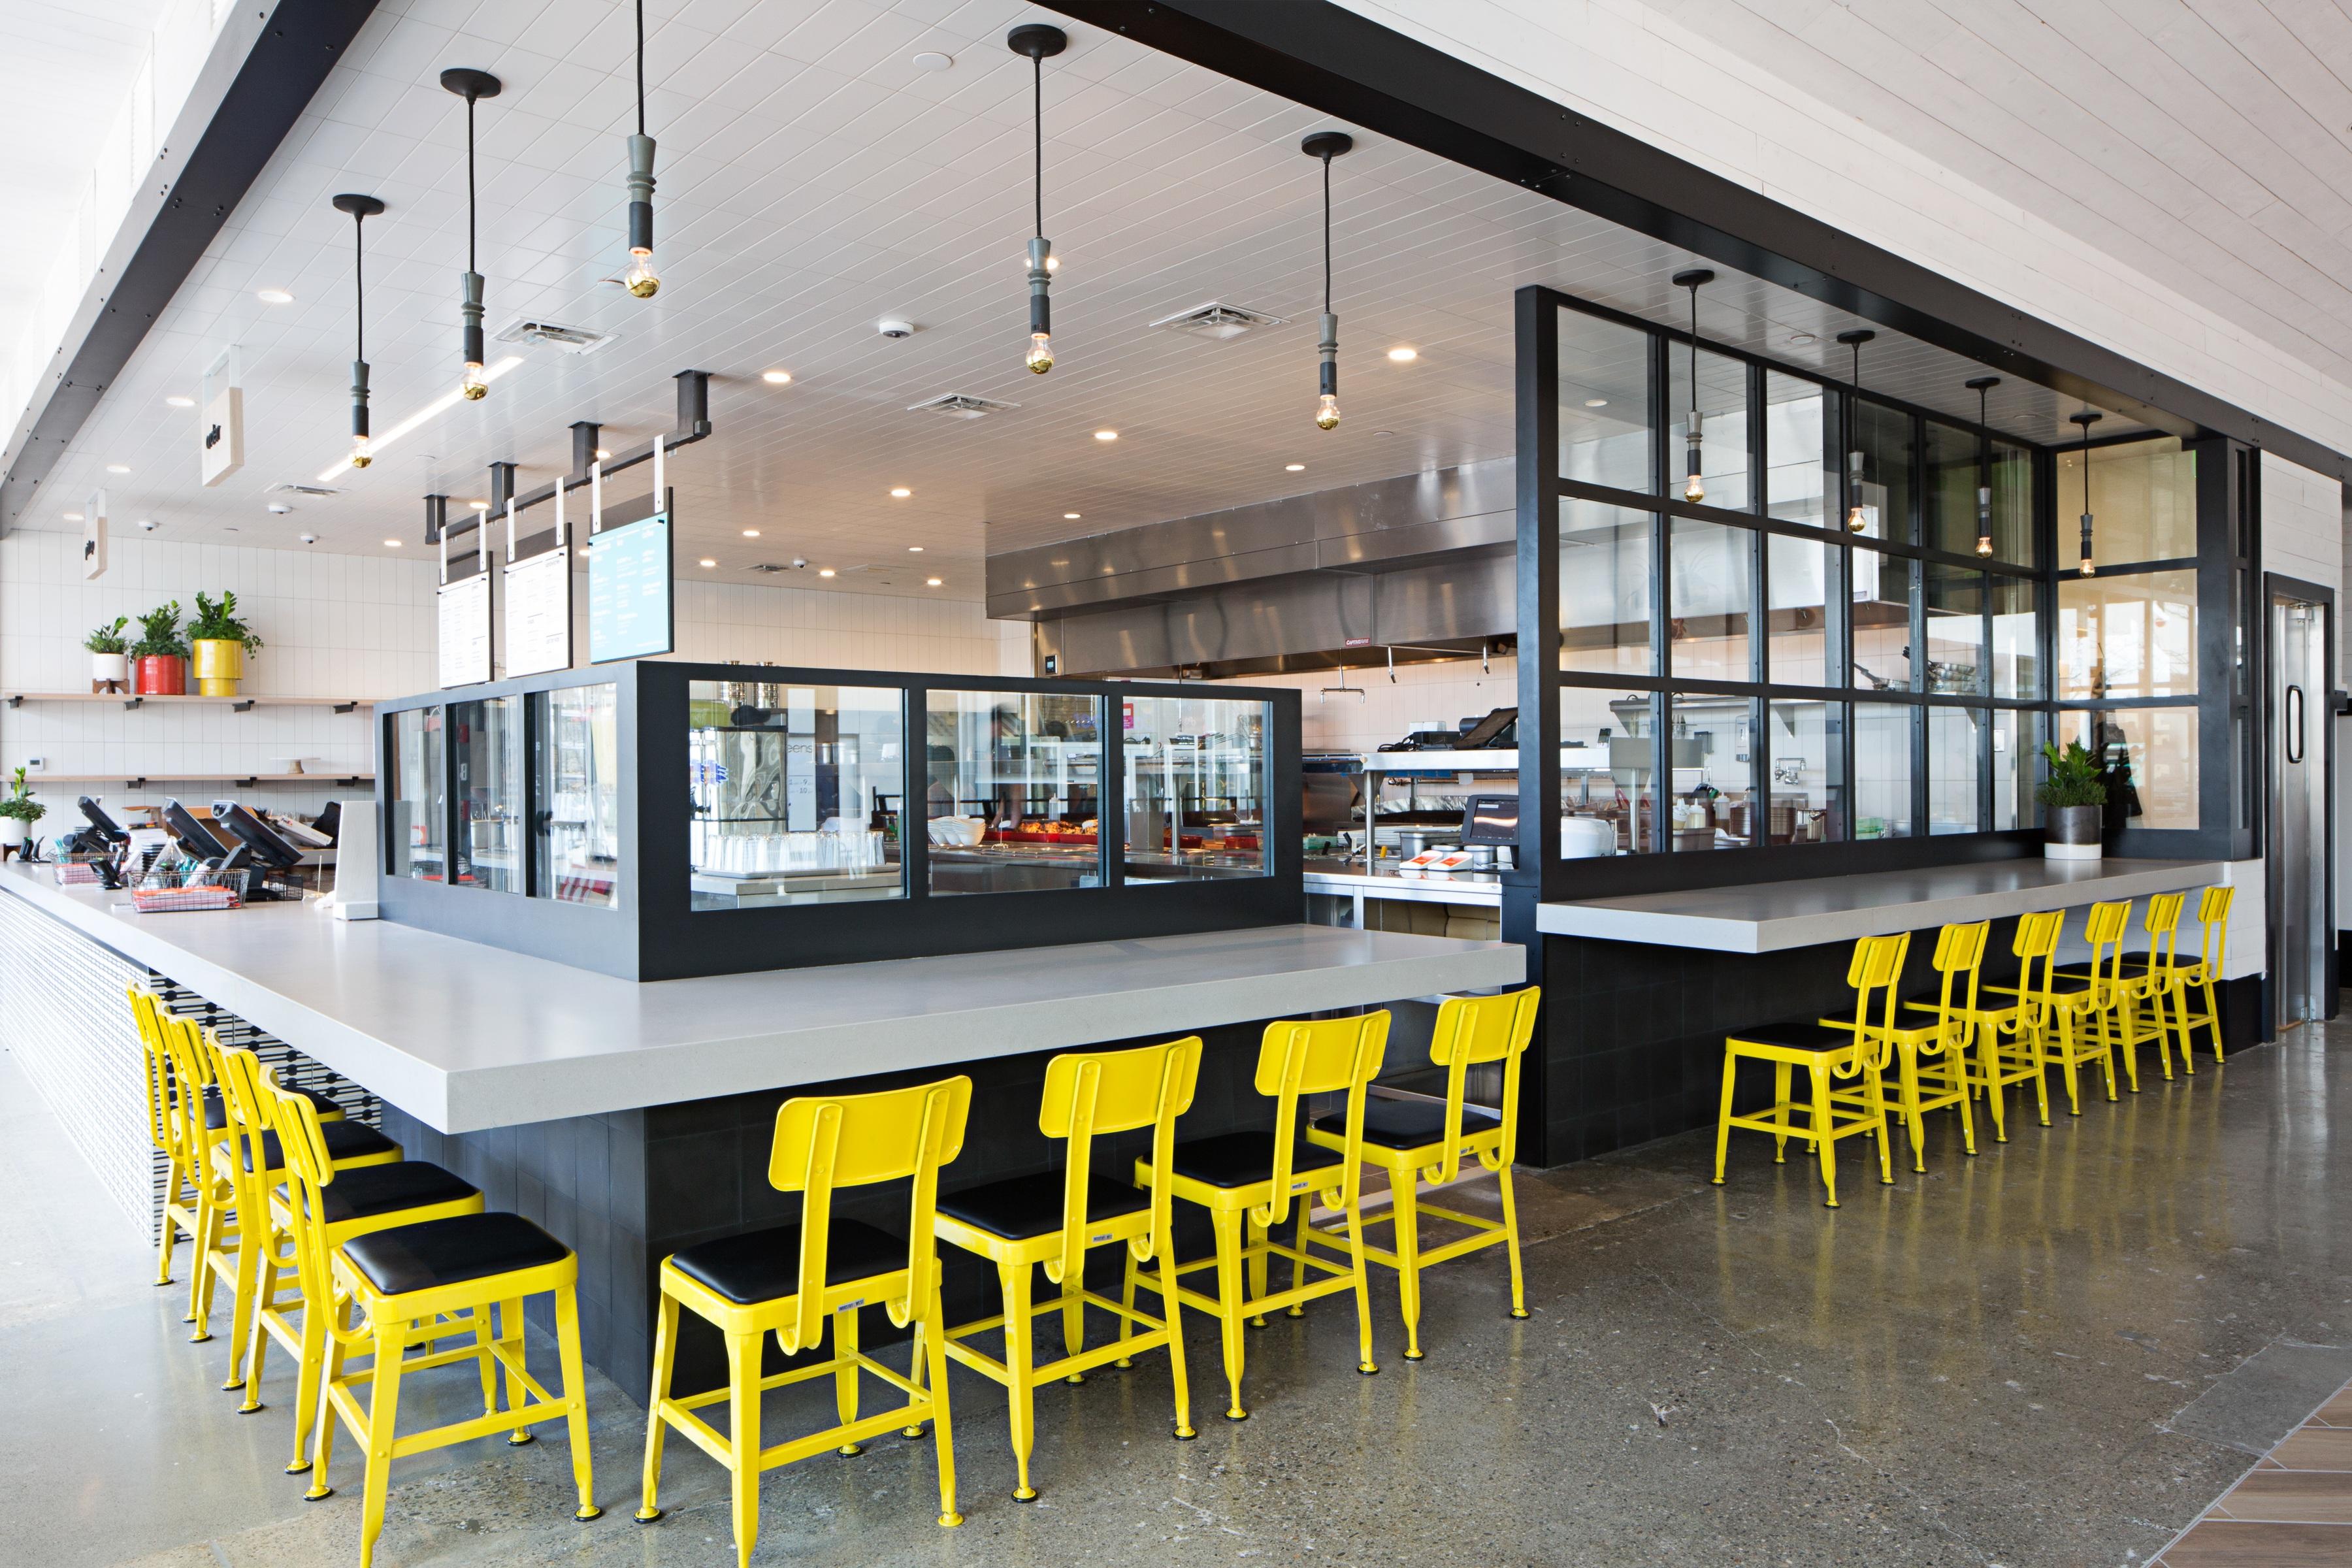 Enchanting California Pizza Kitchen Domain Model - Kitchen Cabinets ...